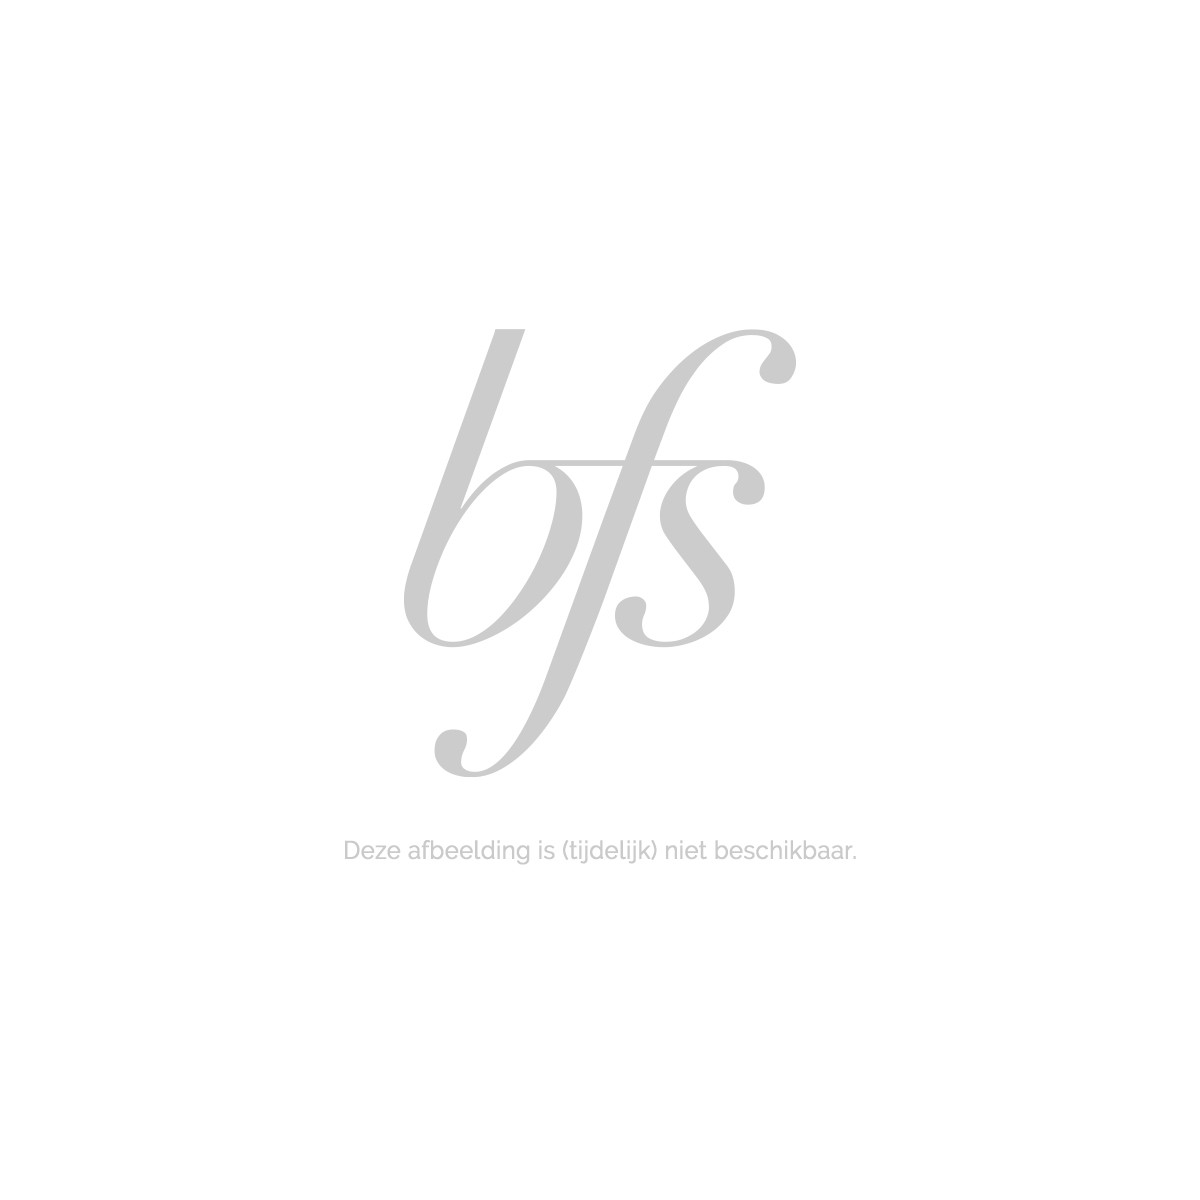 Darphin Soleil Plaisir Face Spf 50